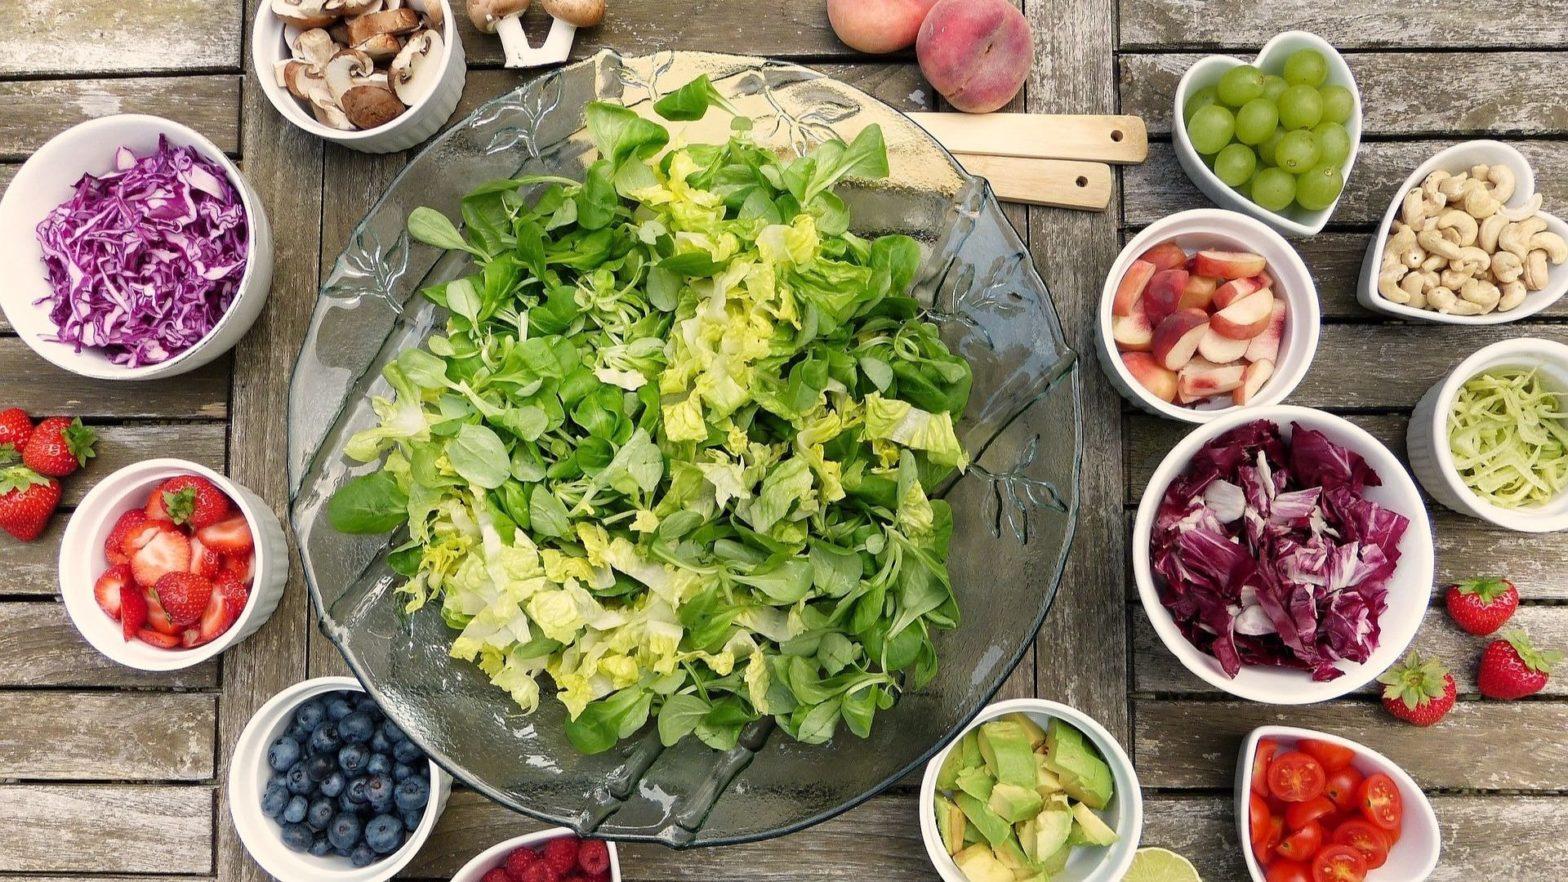 Dieta reeducacao alimentar perder peso cardapio